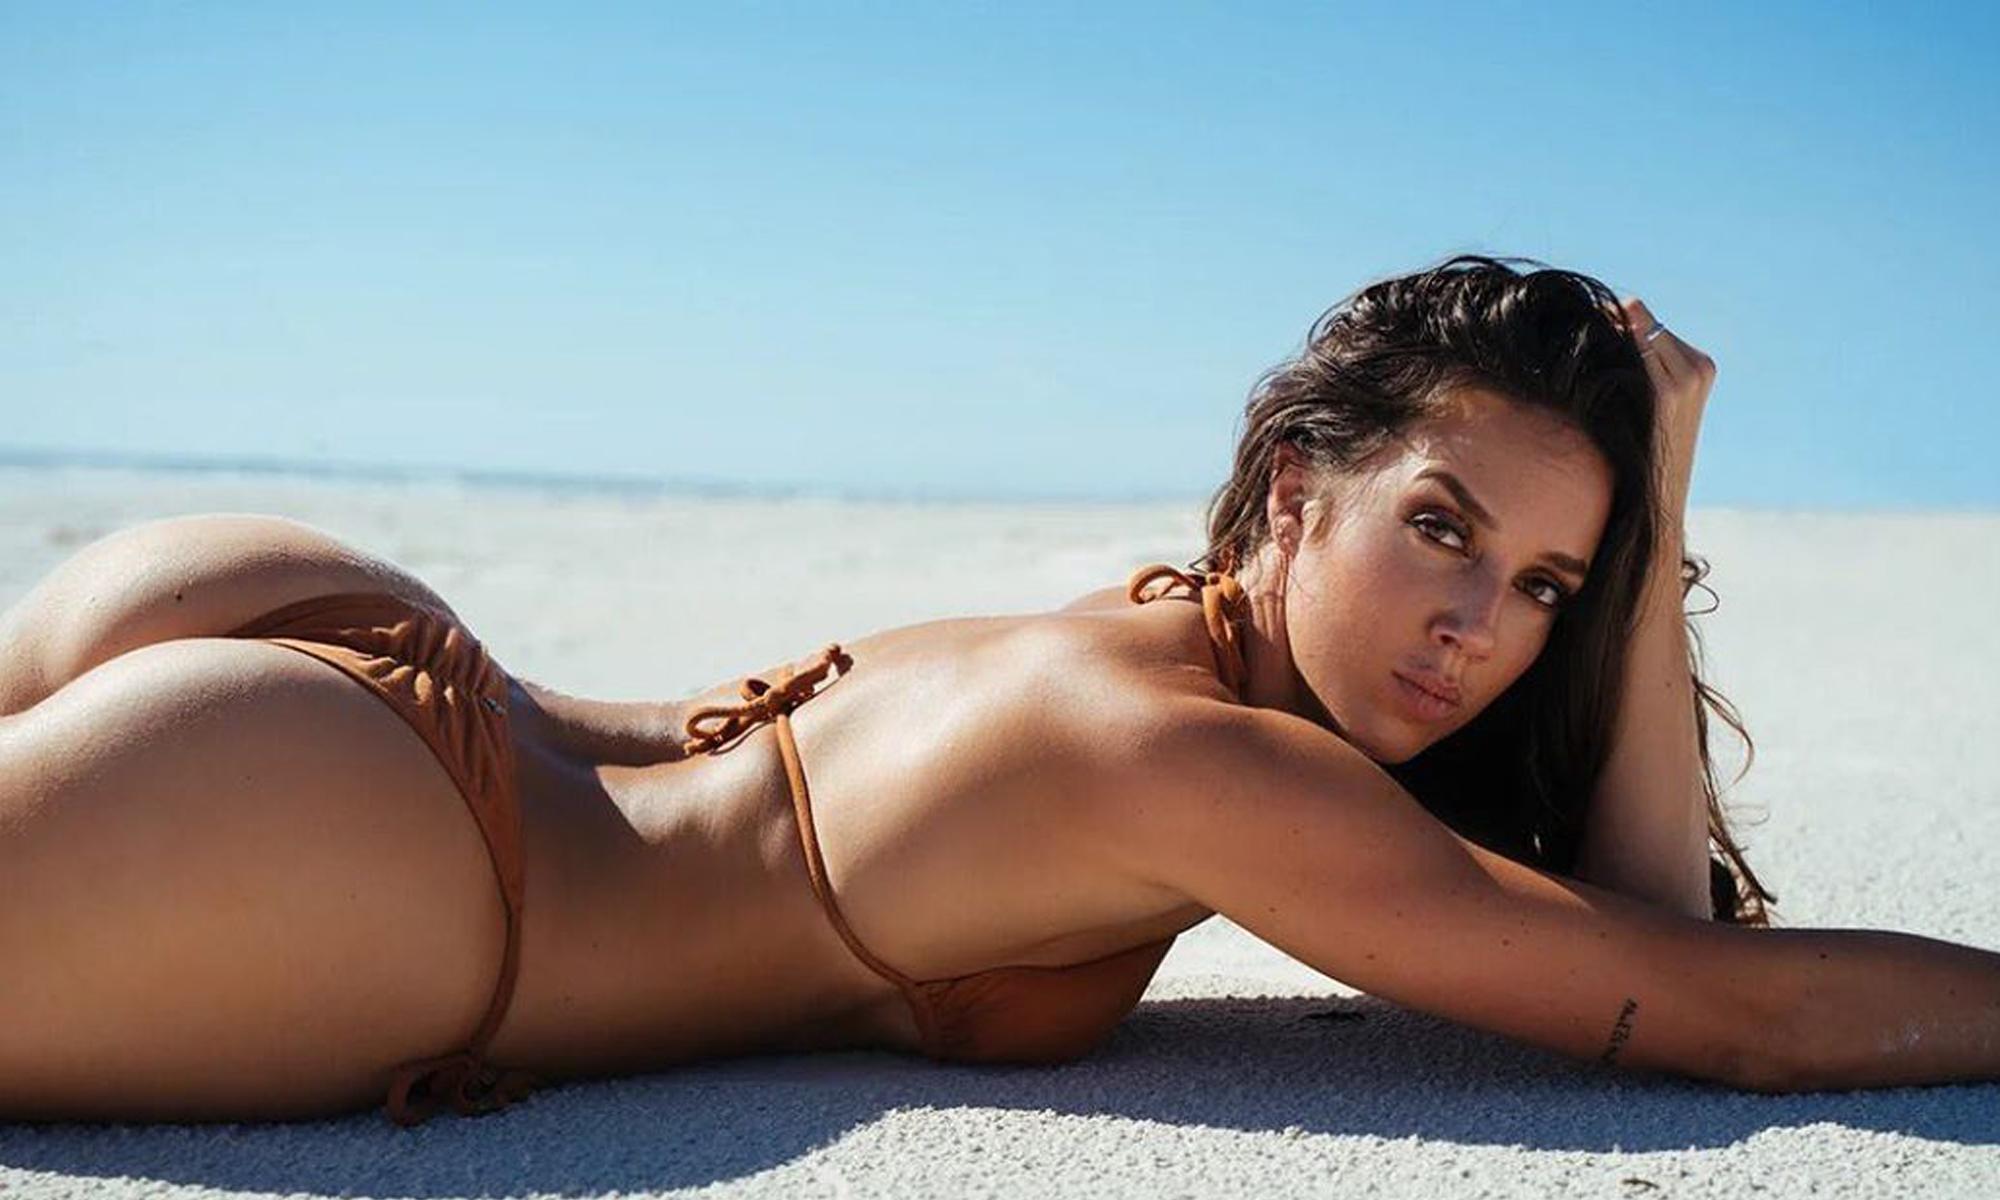 Chelsea Green Bikini